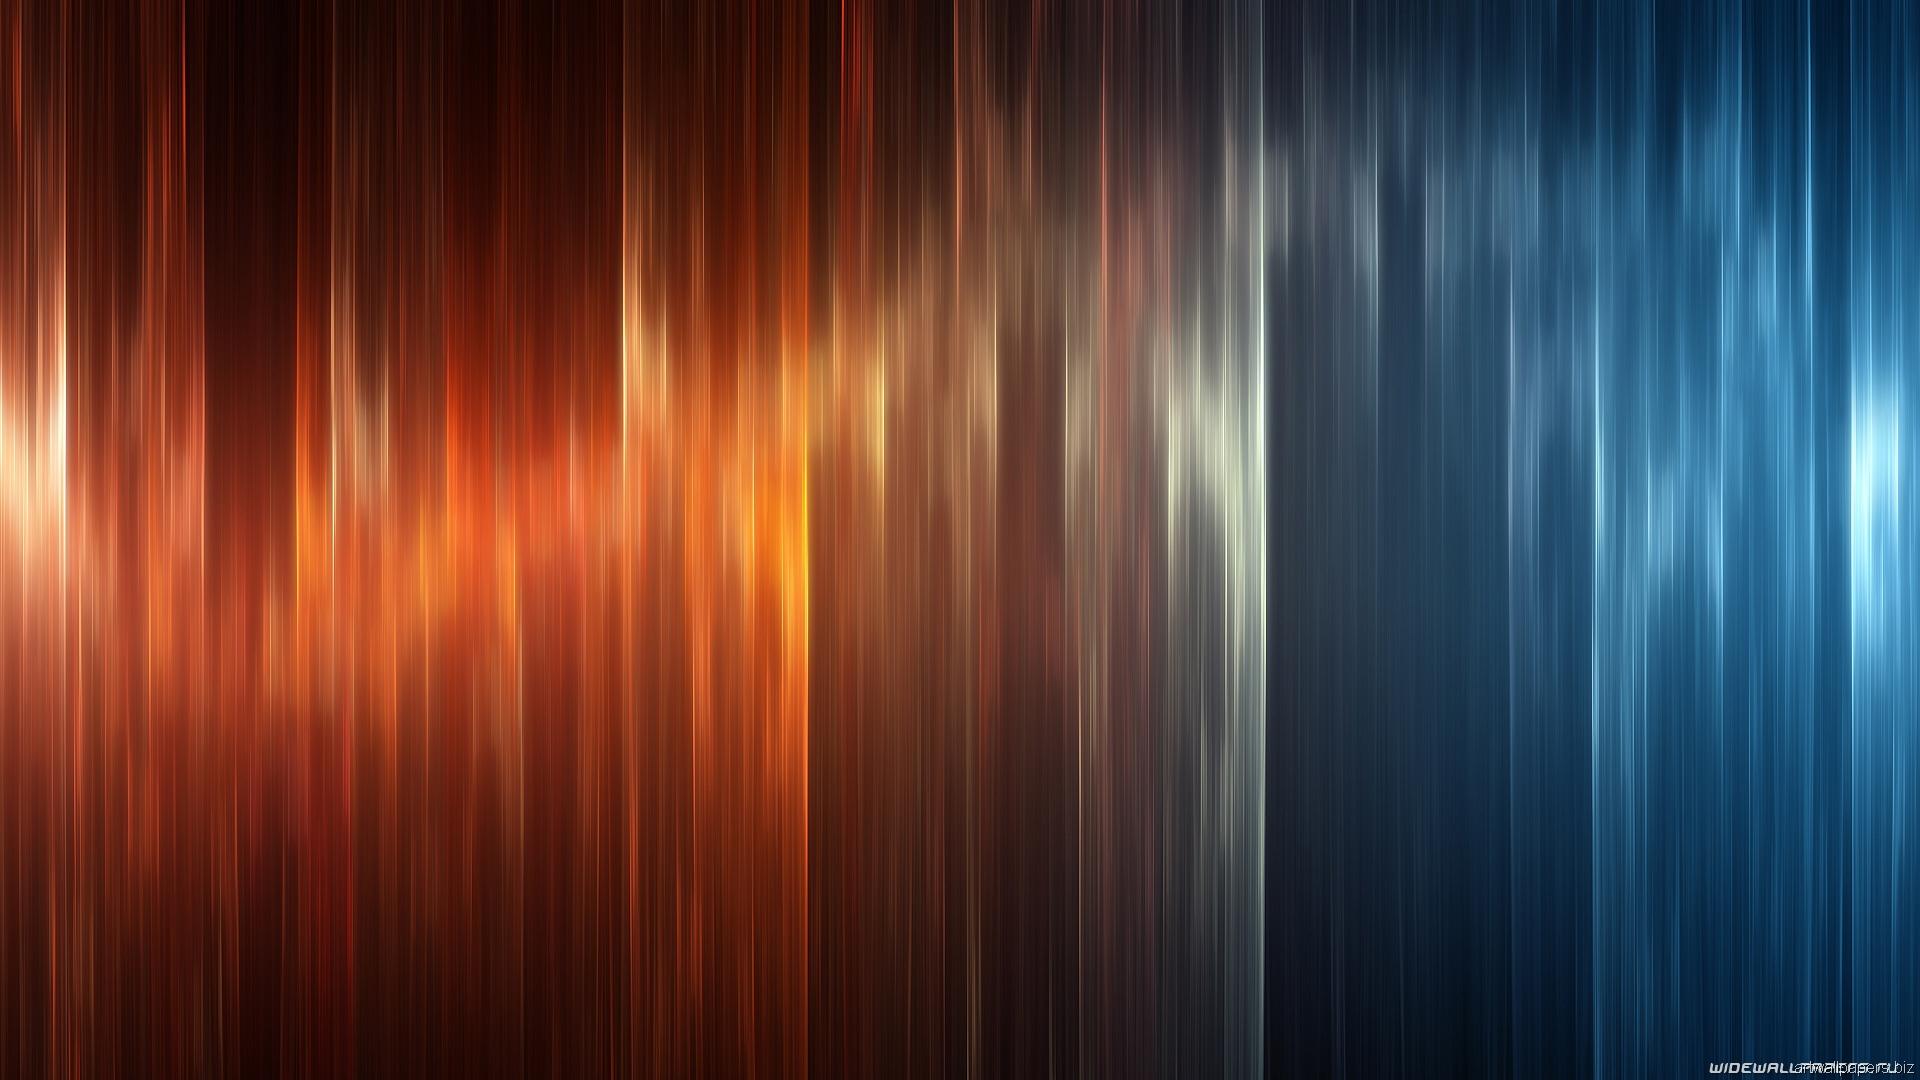 HD Wallpapers Widescreen Desktop Wallpapers Backgrounds Art 1920x1080